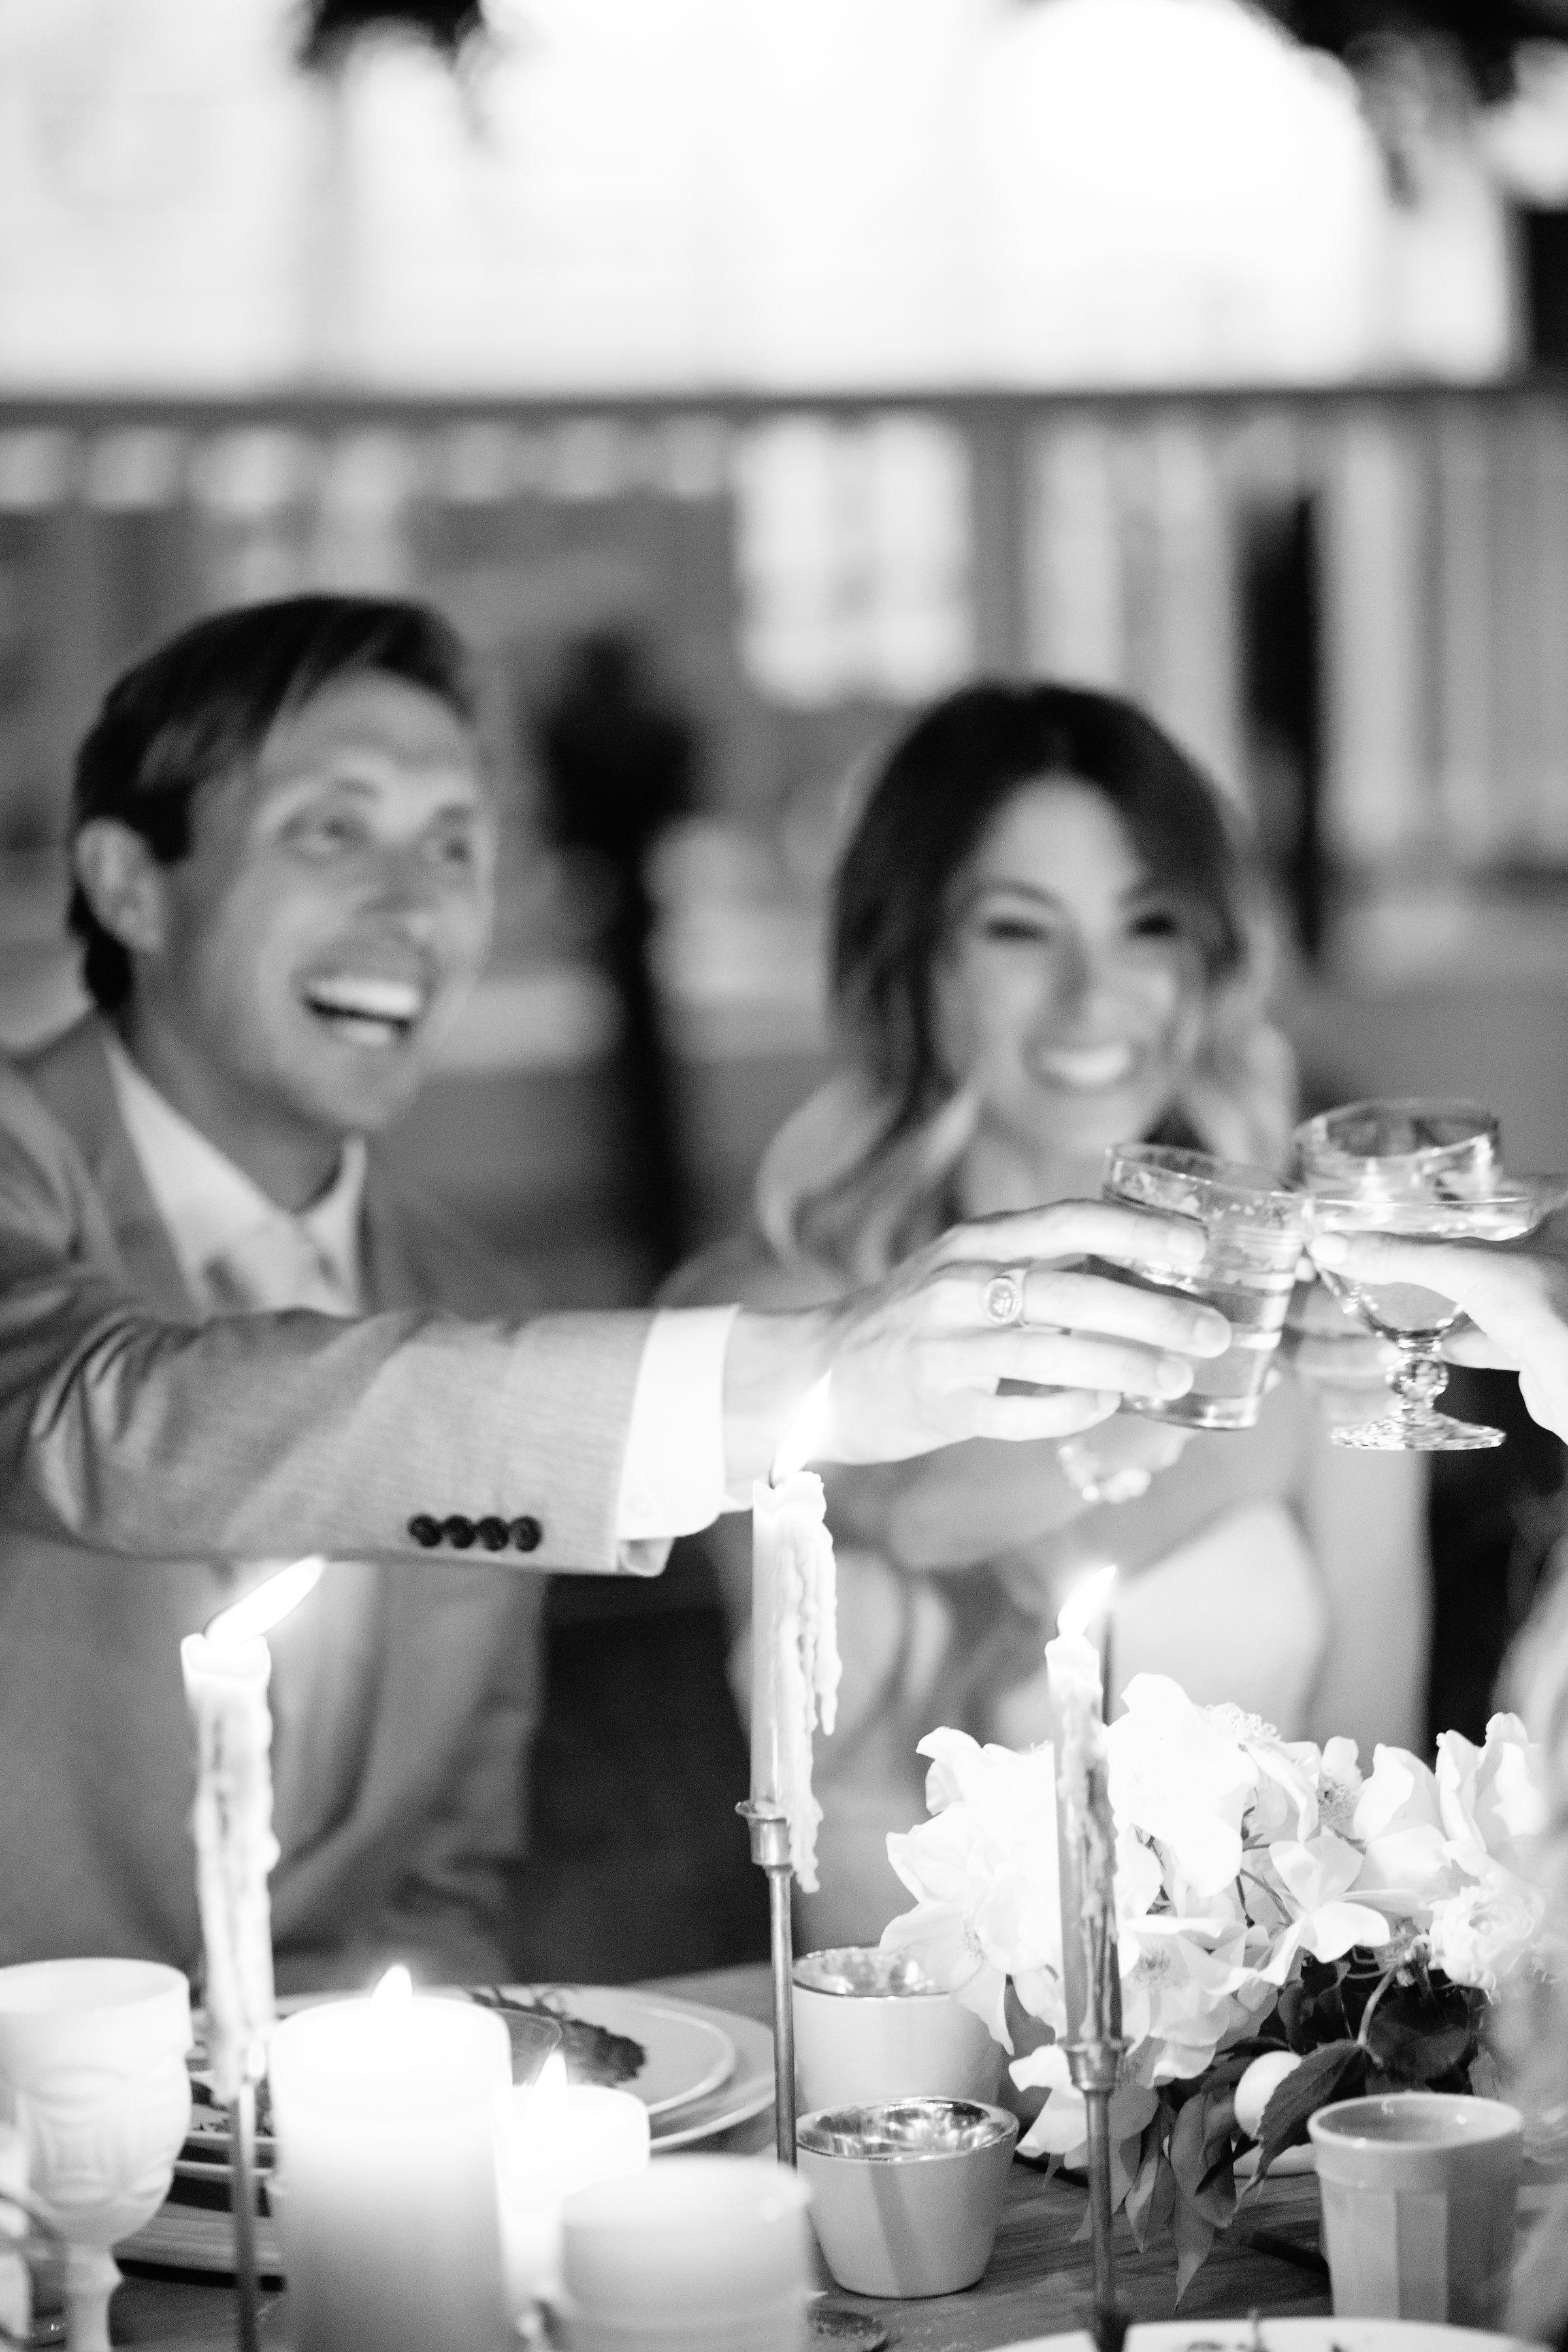 Tenley molzahn taylor leopold wedding toasts black and white